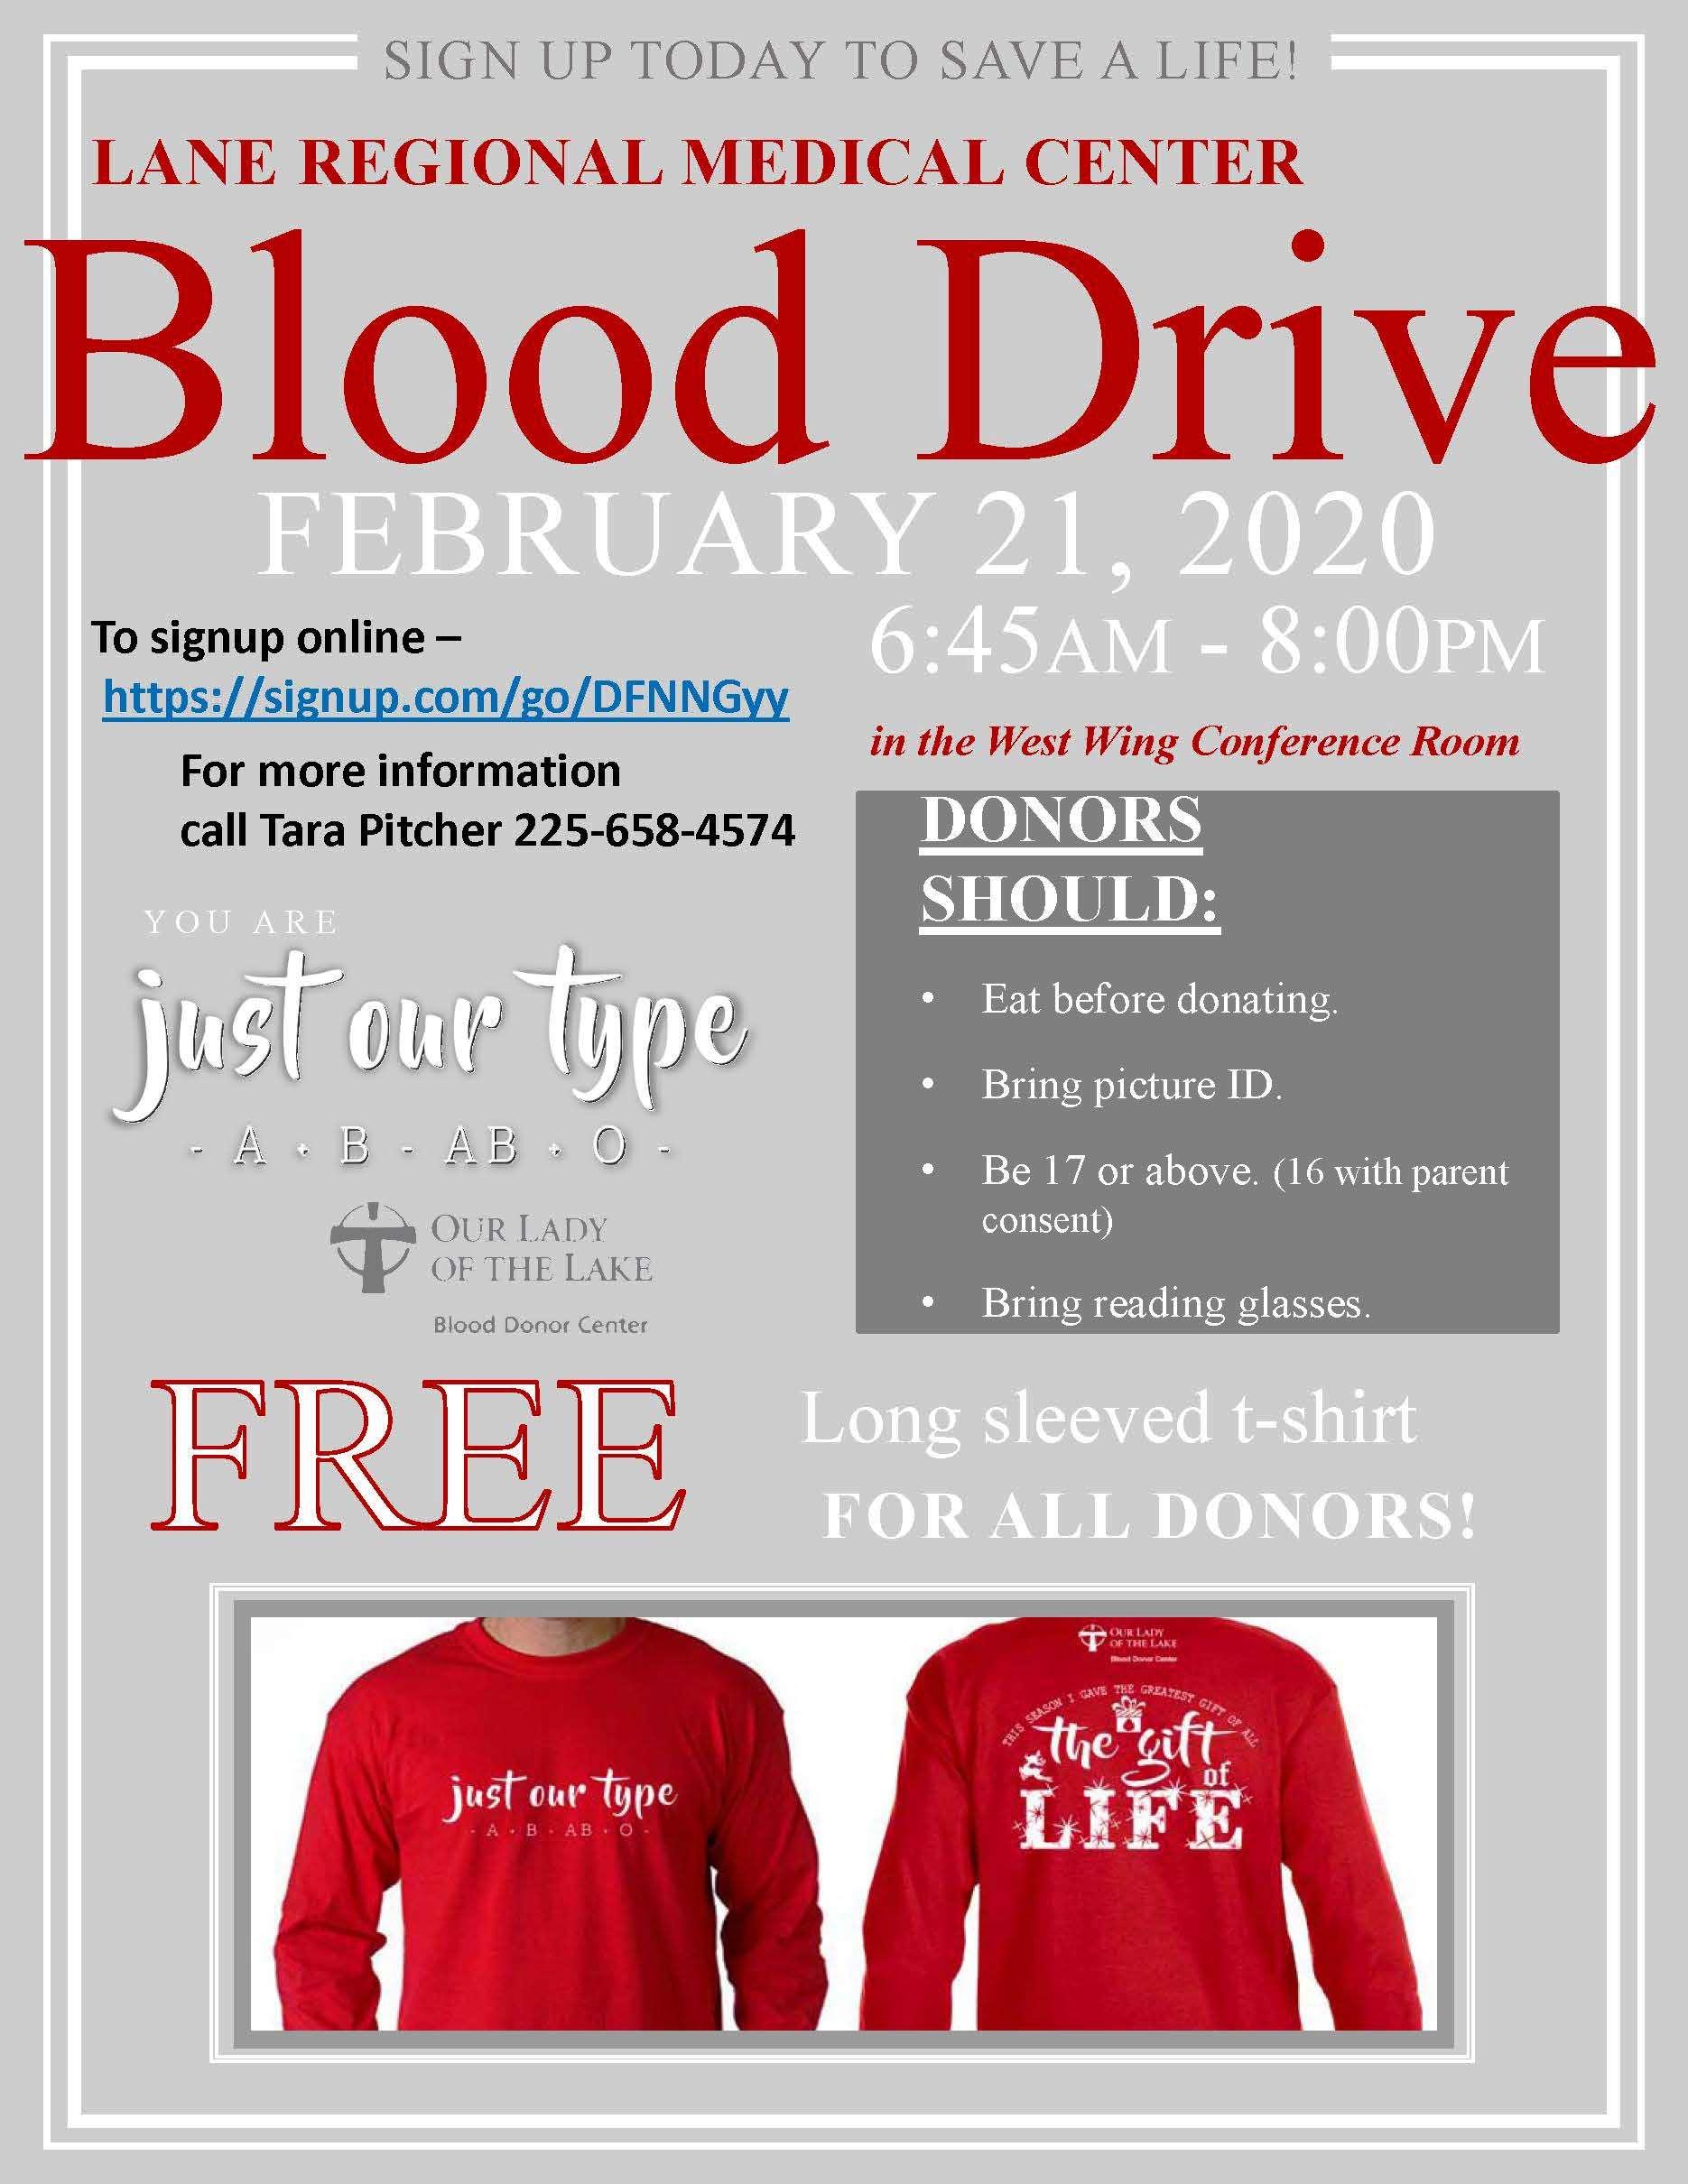 Blood Drive at Lane Regional Medical Center February 21st